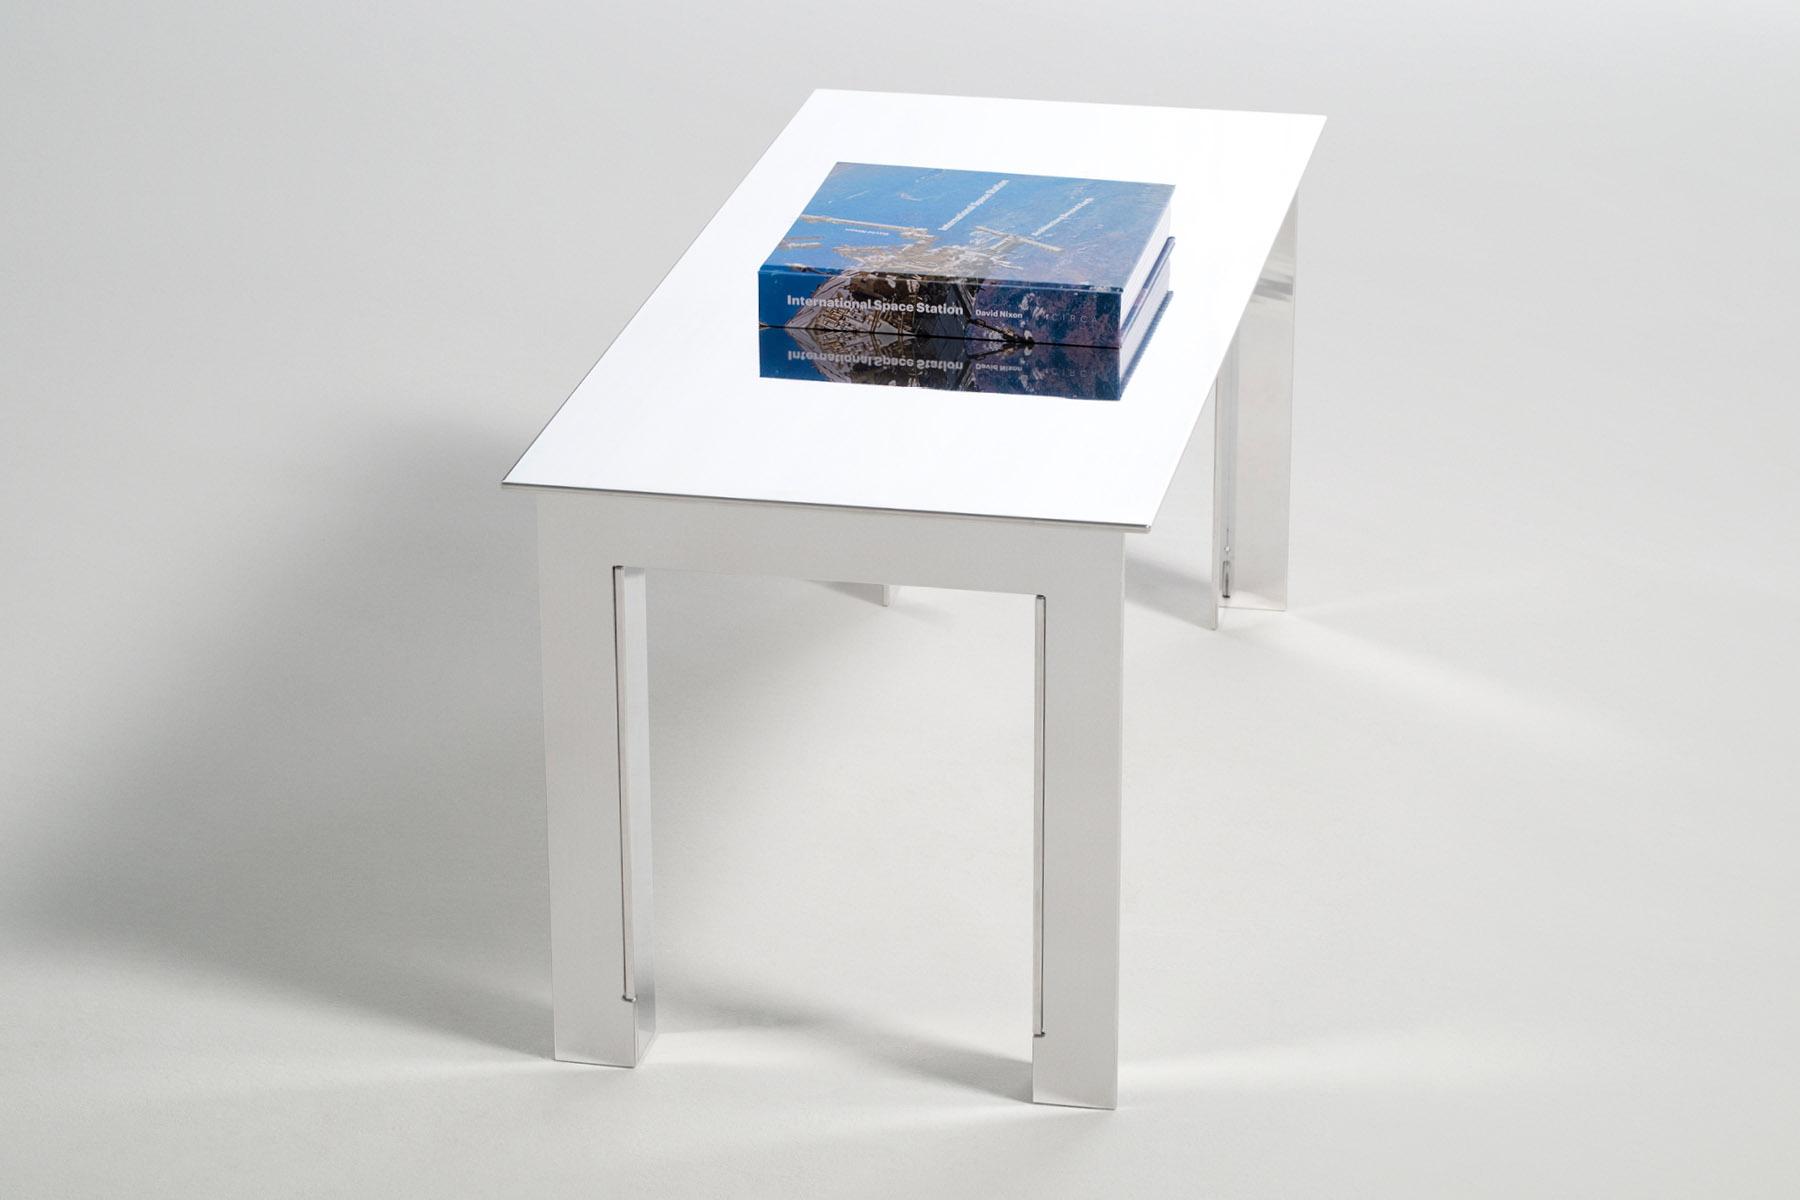 Aluminium coffee table seen at an angle